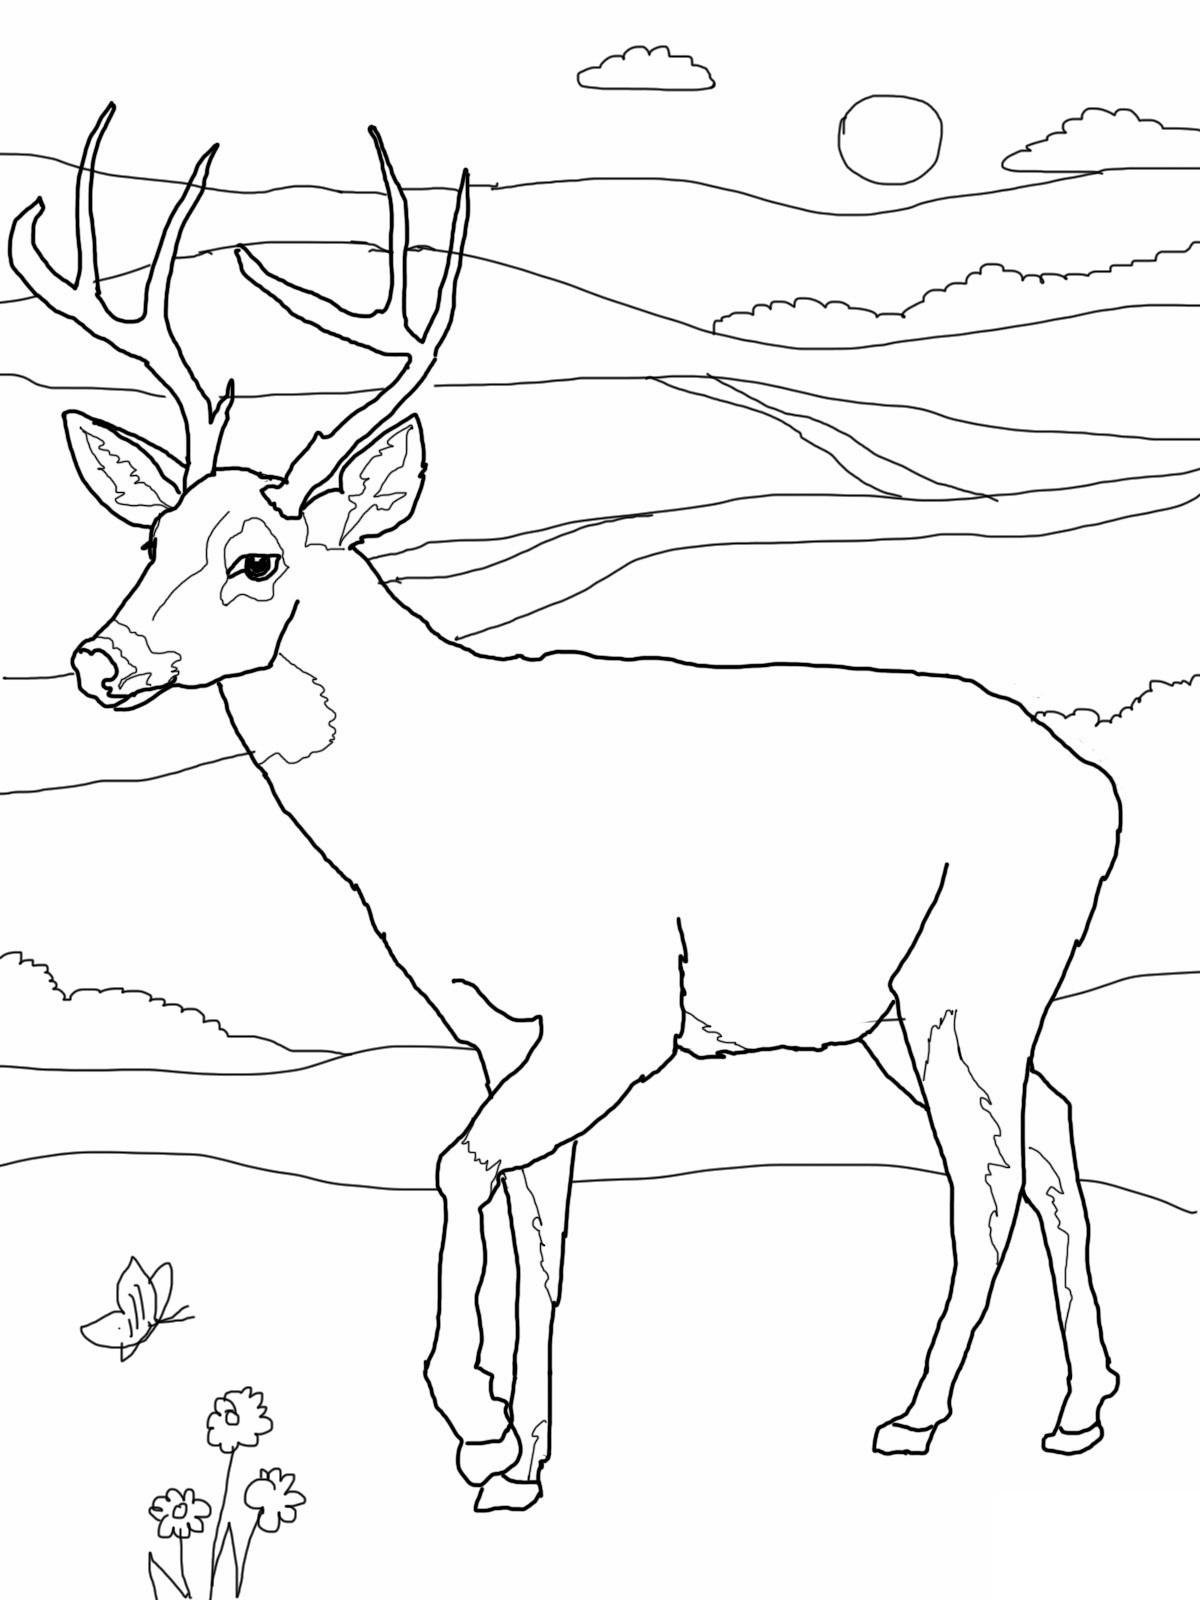 Kumpulan Gambar Kartun Binatang Rusa